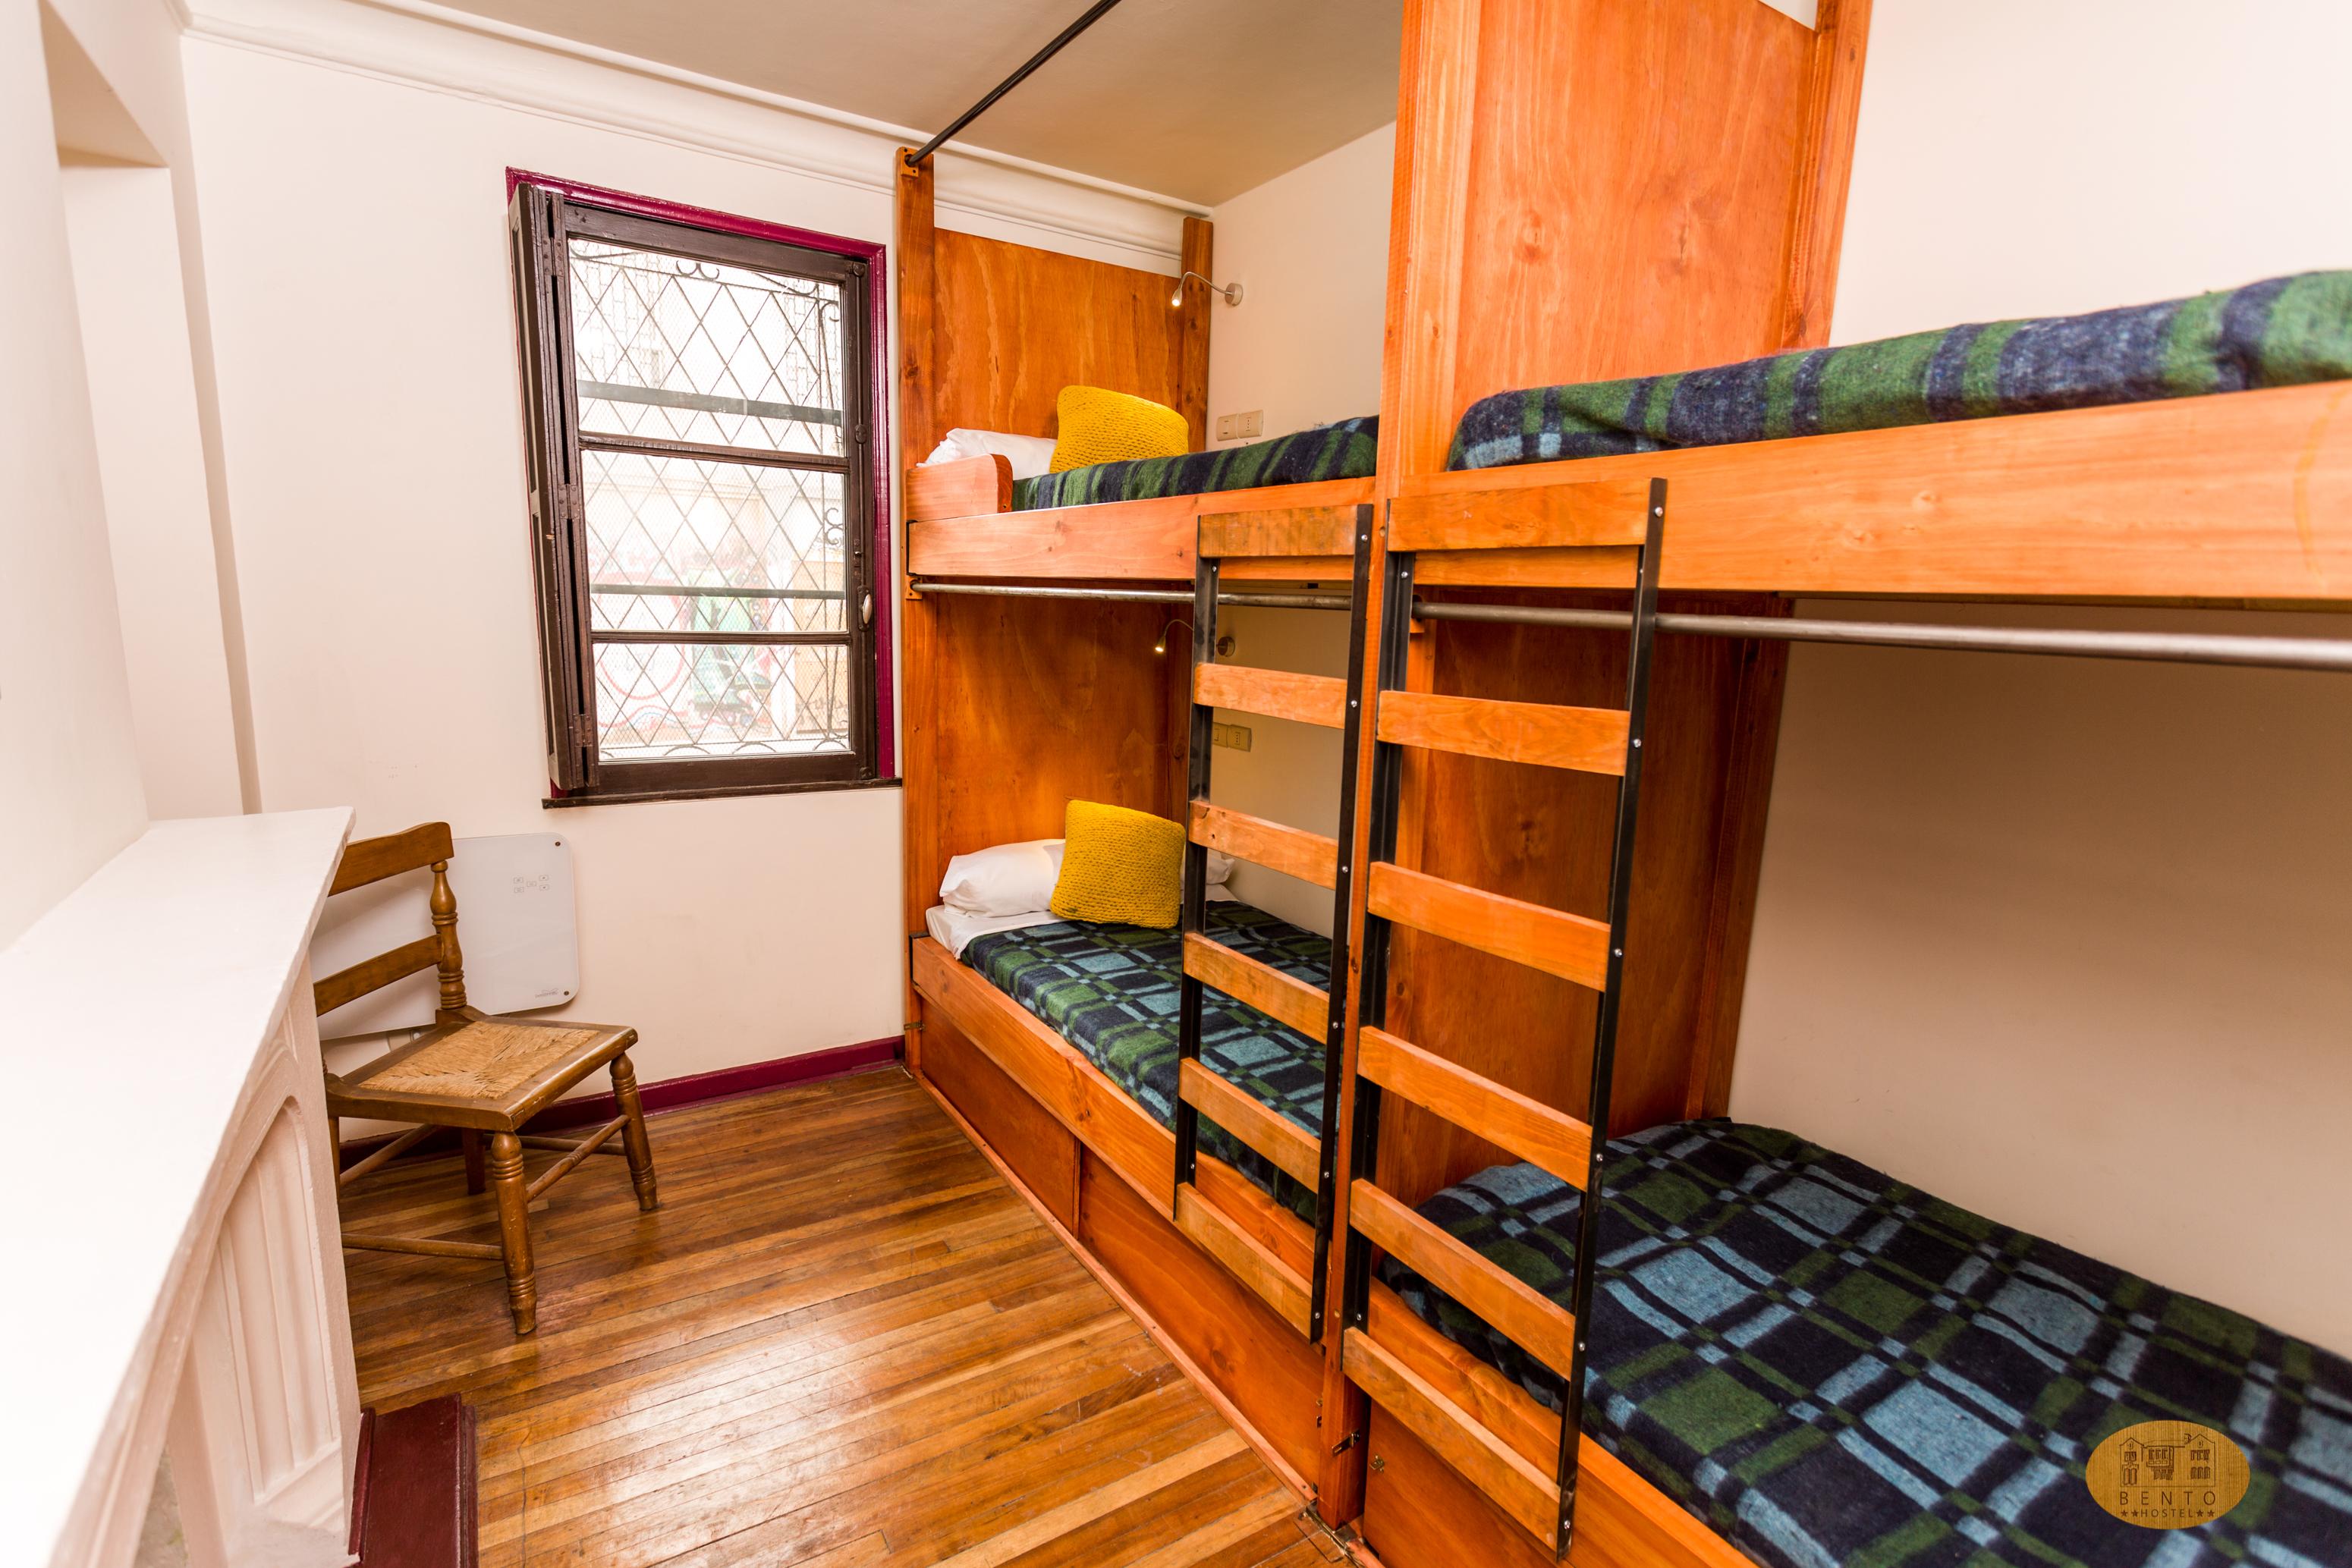 Bento Hostel